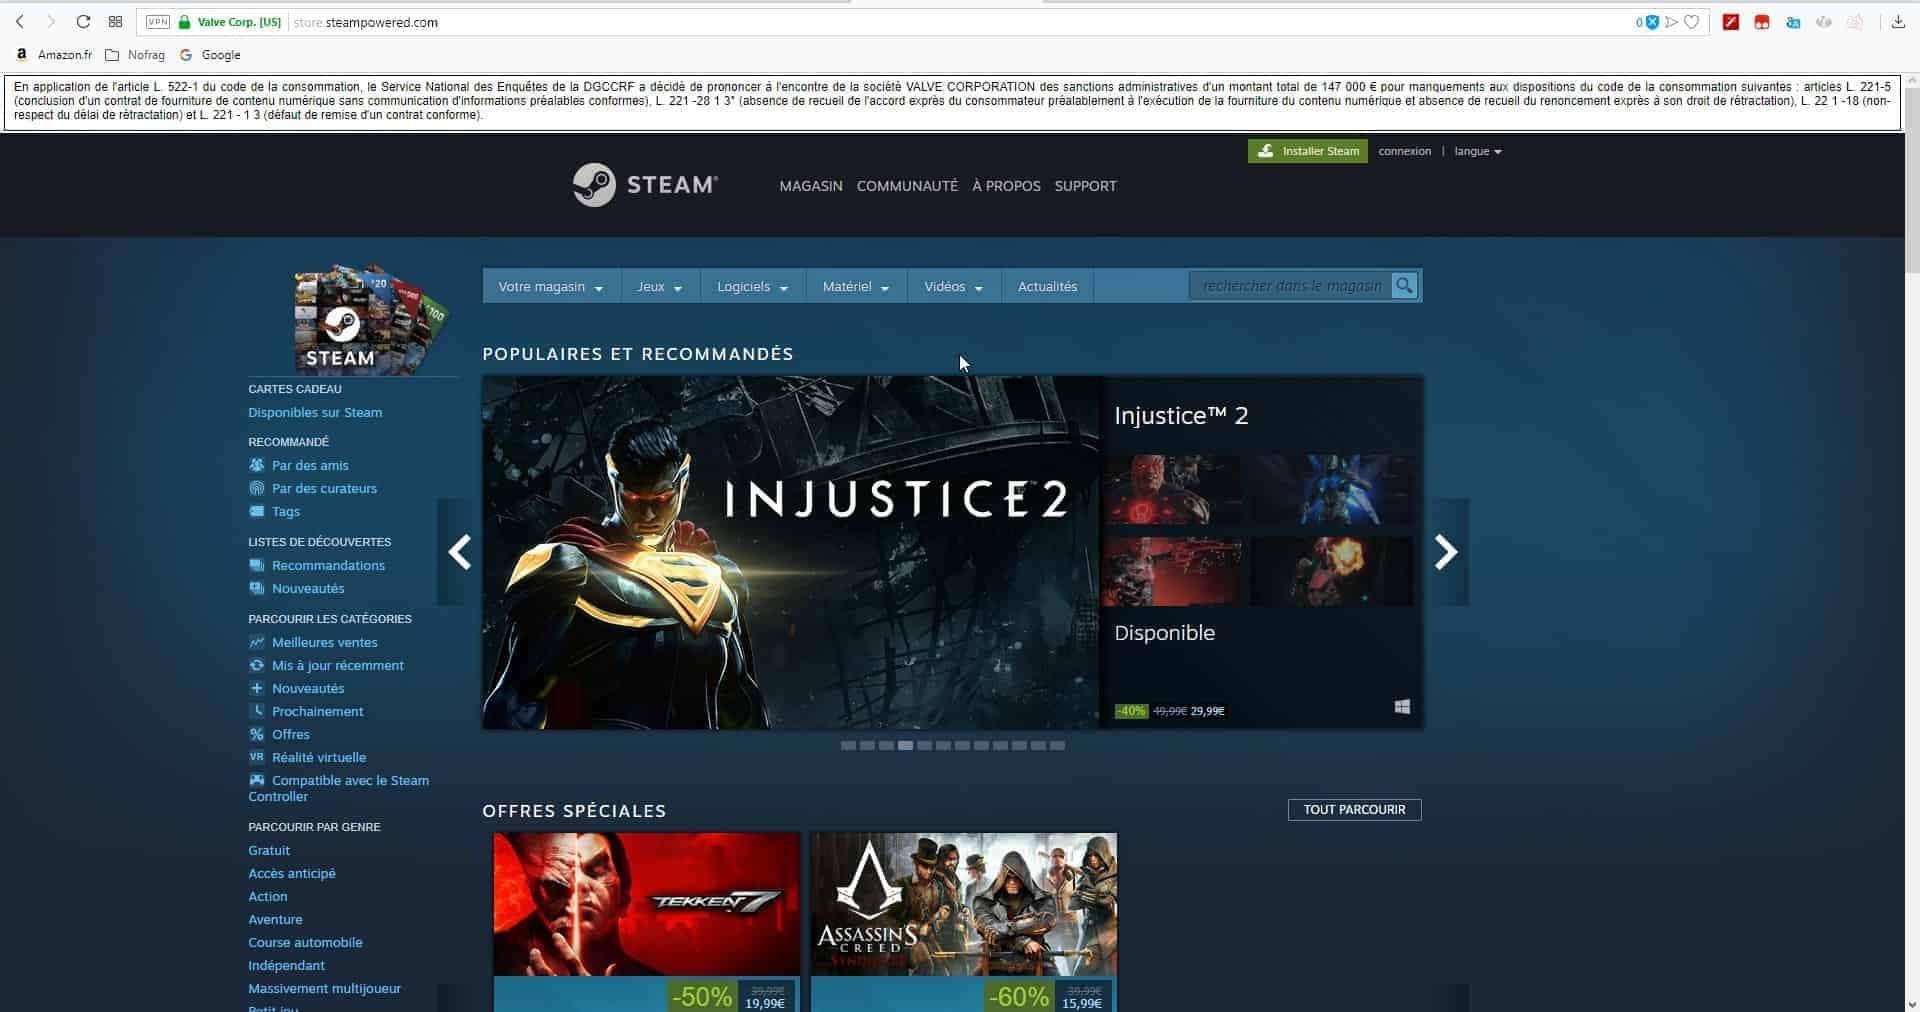 steam uplay multa - Valve e Ubisoft multate in Francia per scarsa trasparenza sui rimborsi